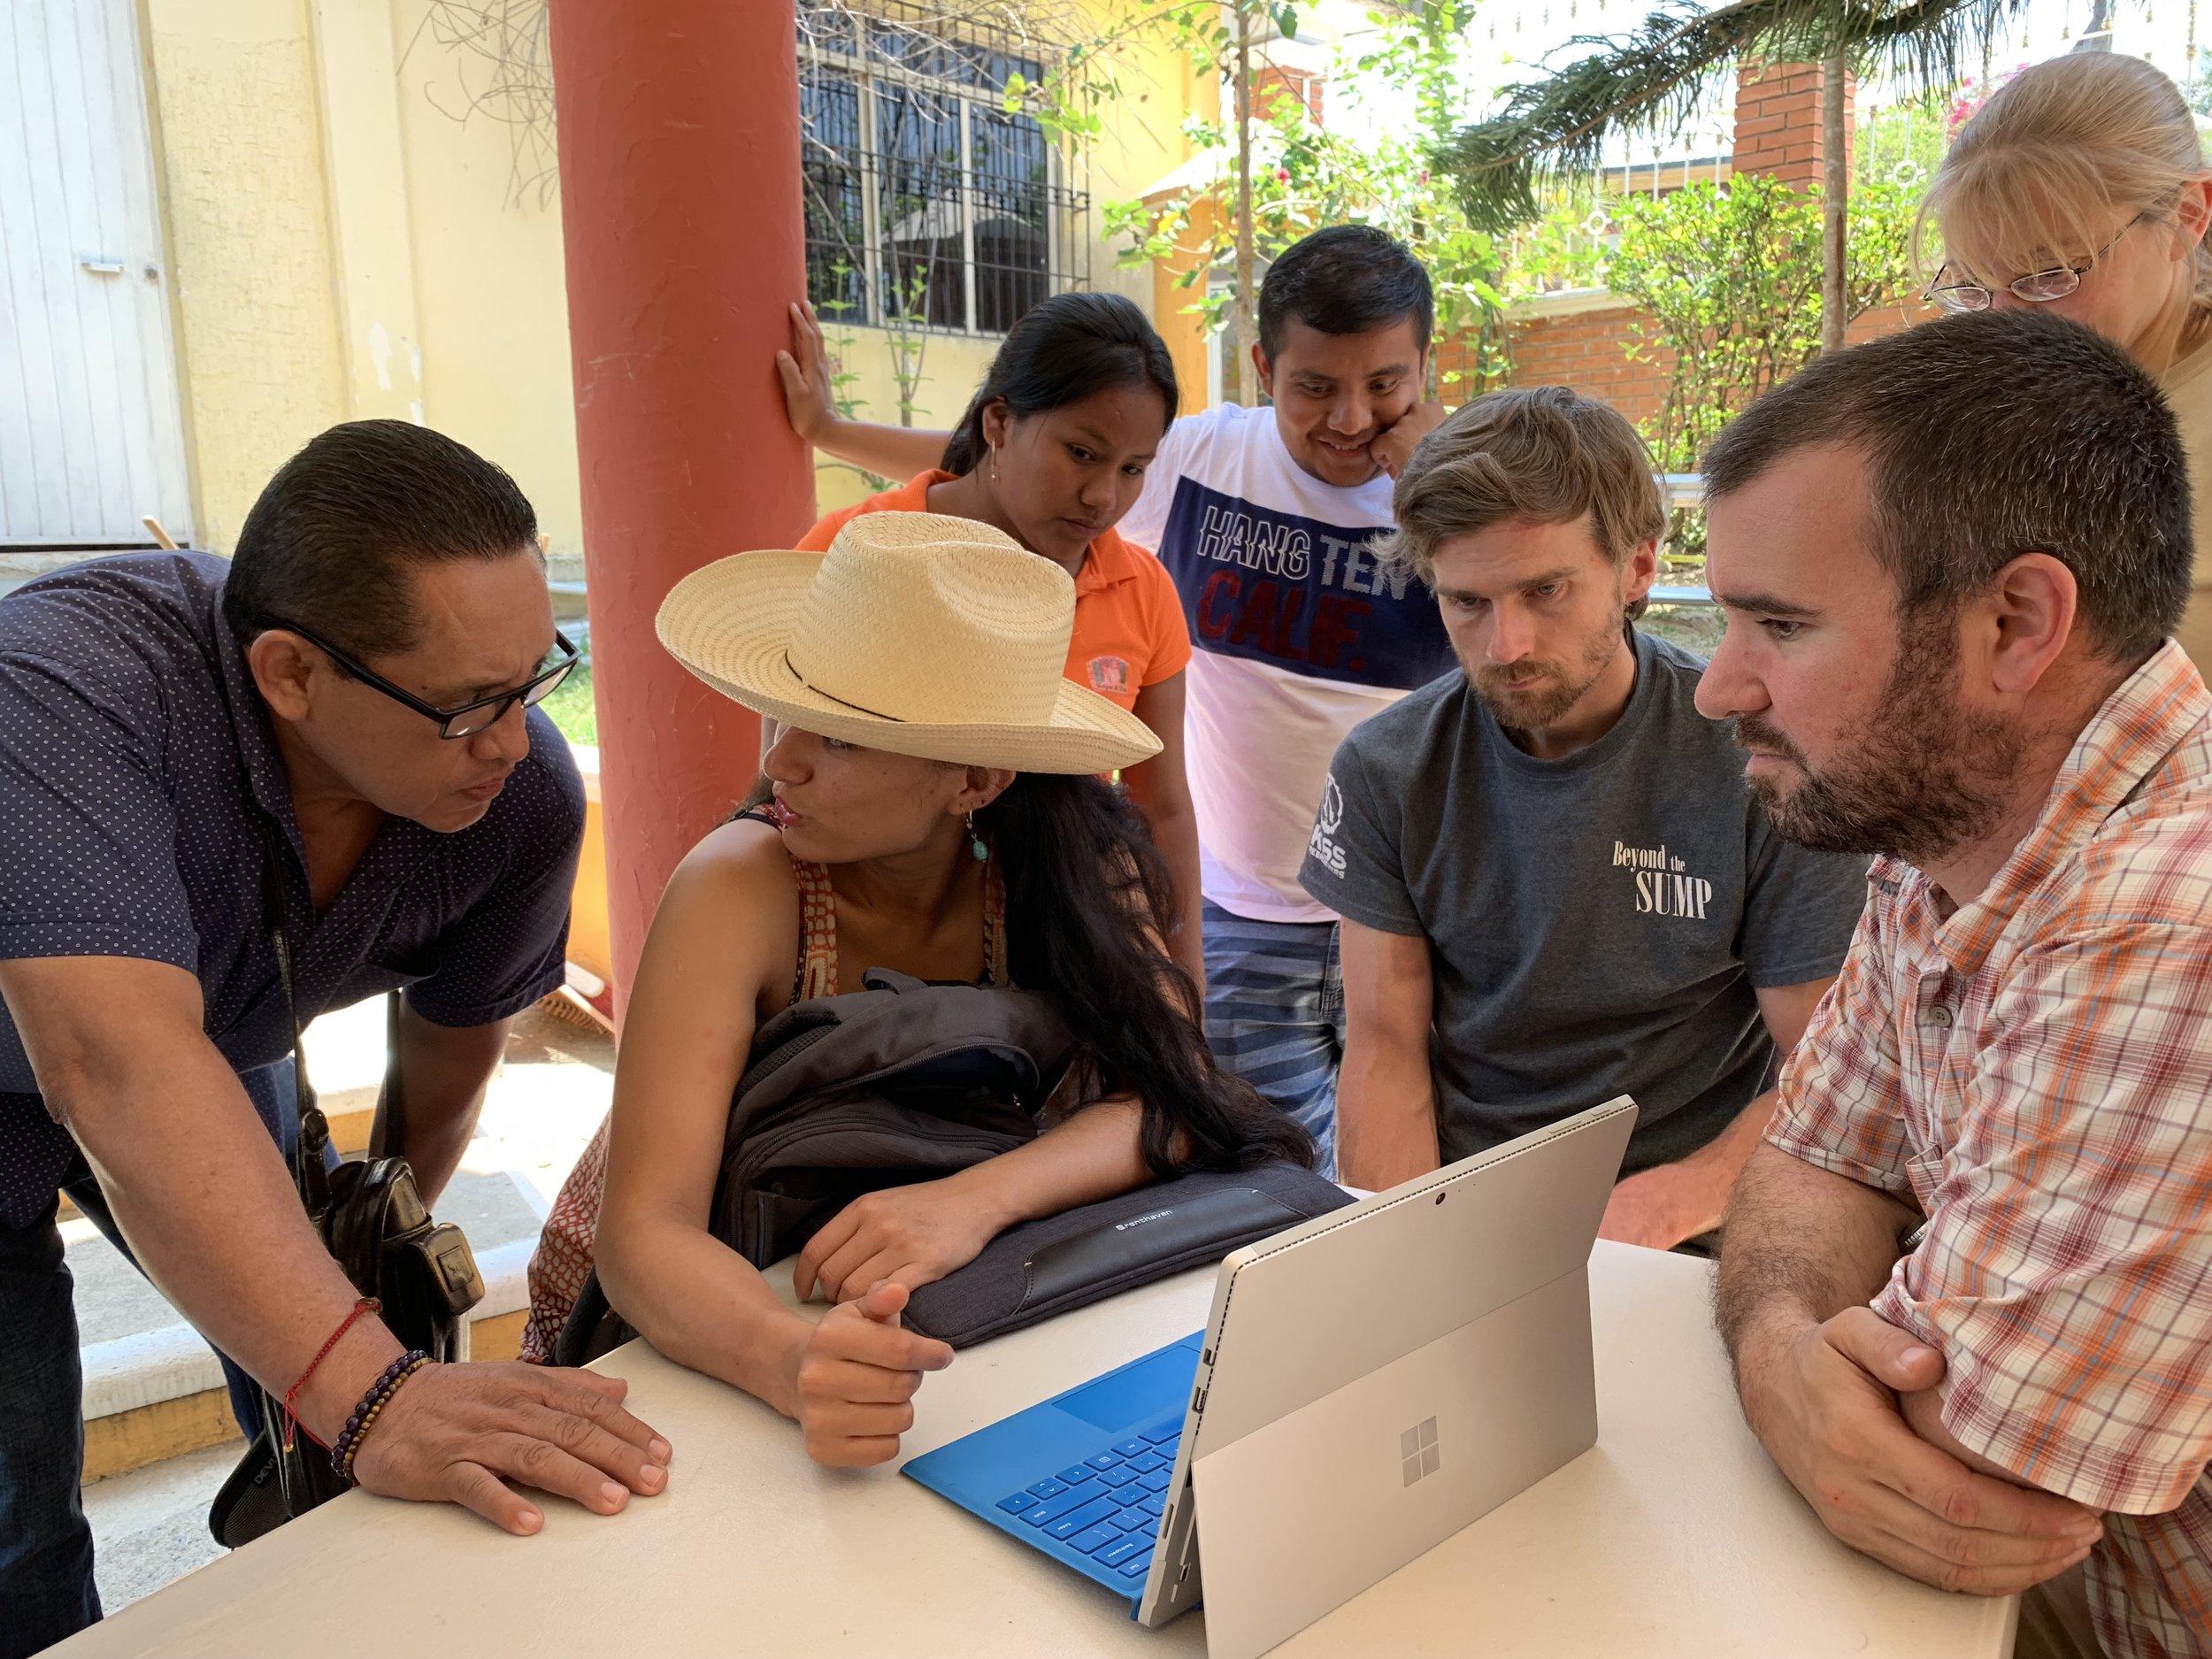 Alejandra Mendoza, Jon Lillestole, and Zeb Lilly showinf expedition photos to locals of San Felipe Jalapa de Díaz. Photo by Teddy Garlock.